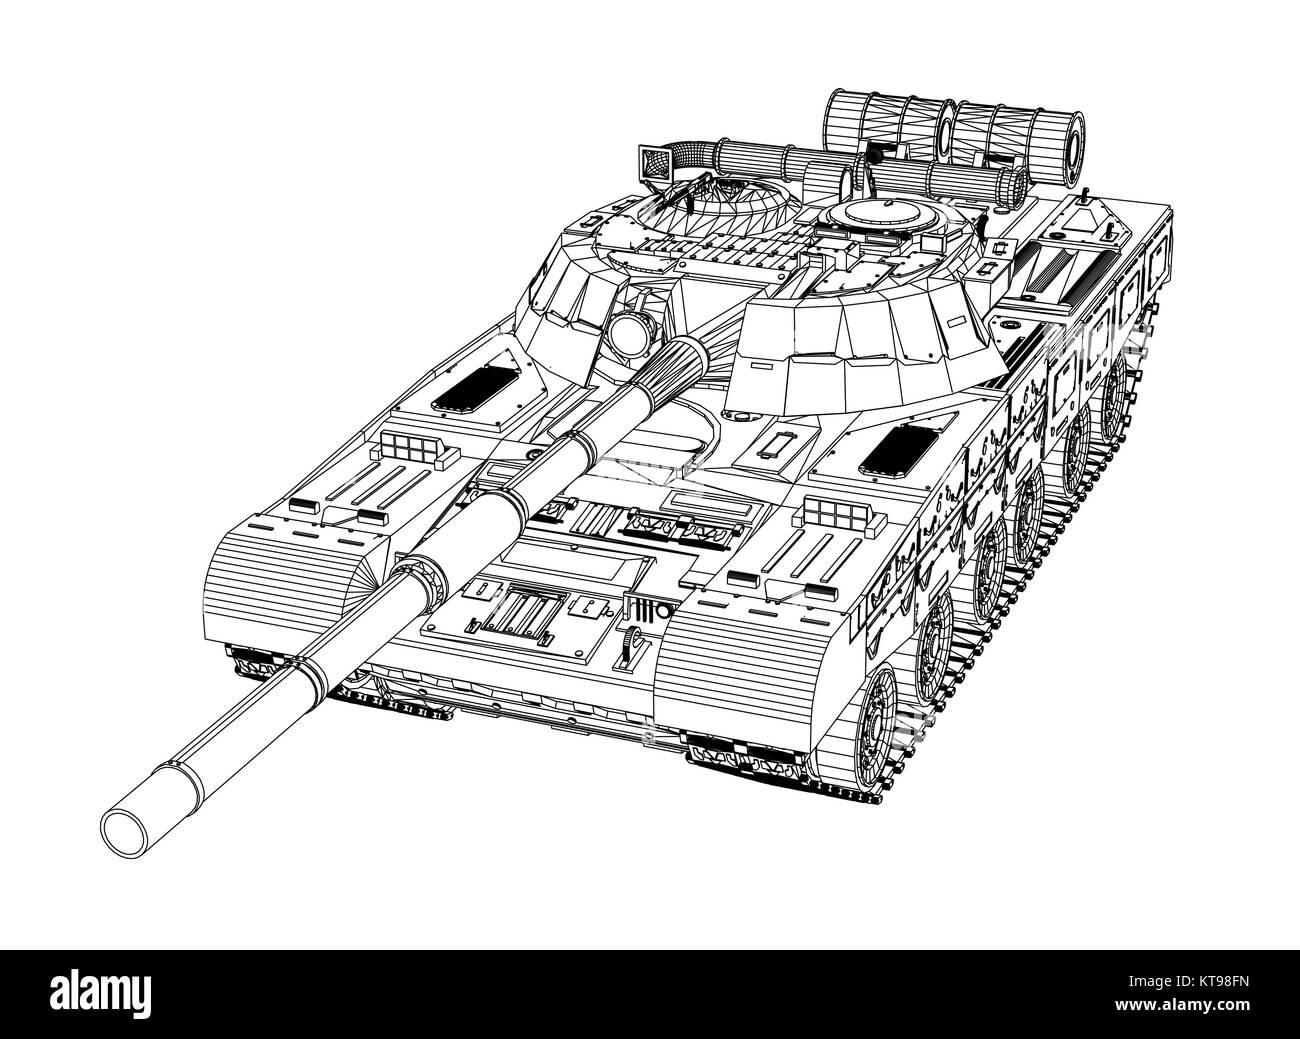 Blueprint of realistic tank stock vector art illustration vector blueprint of realistic tank stock vector art illustration vector image 169849337 alamy malvernweather Choice Image